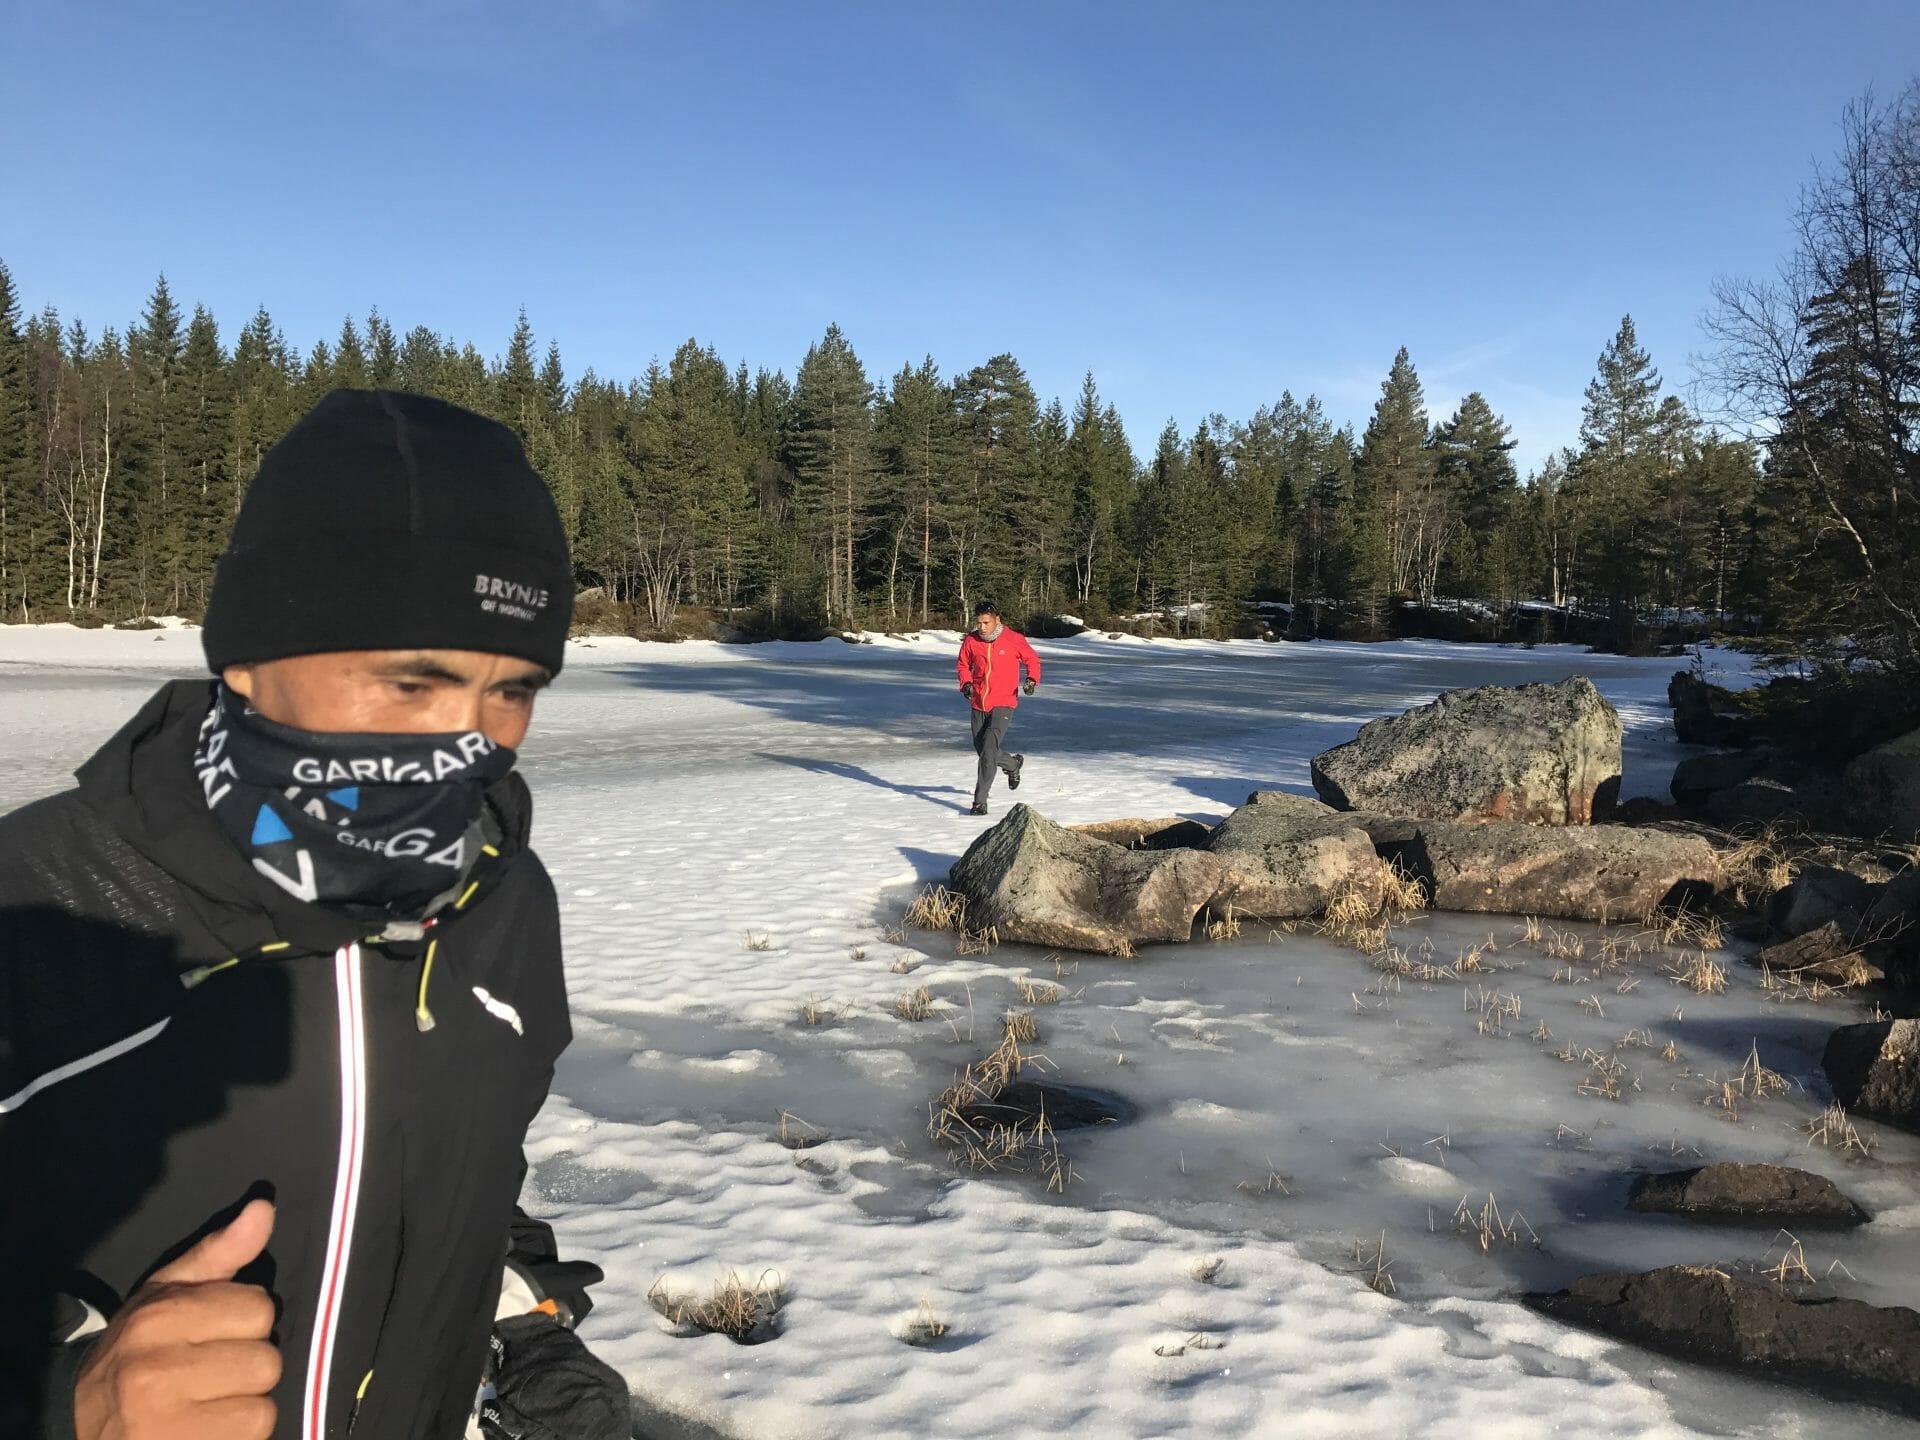 North Pole Marathon Exploring the limits